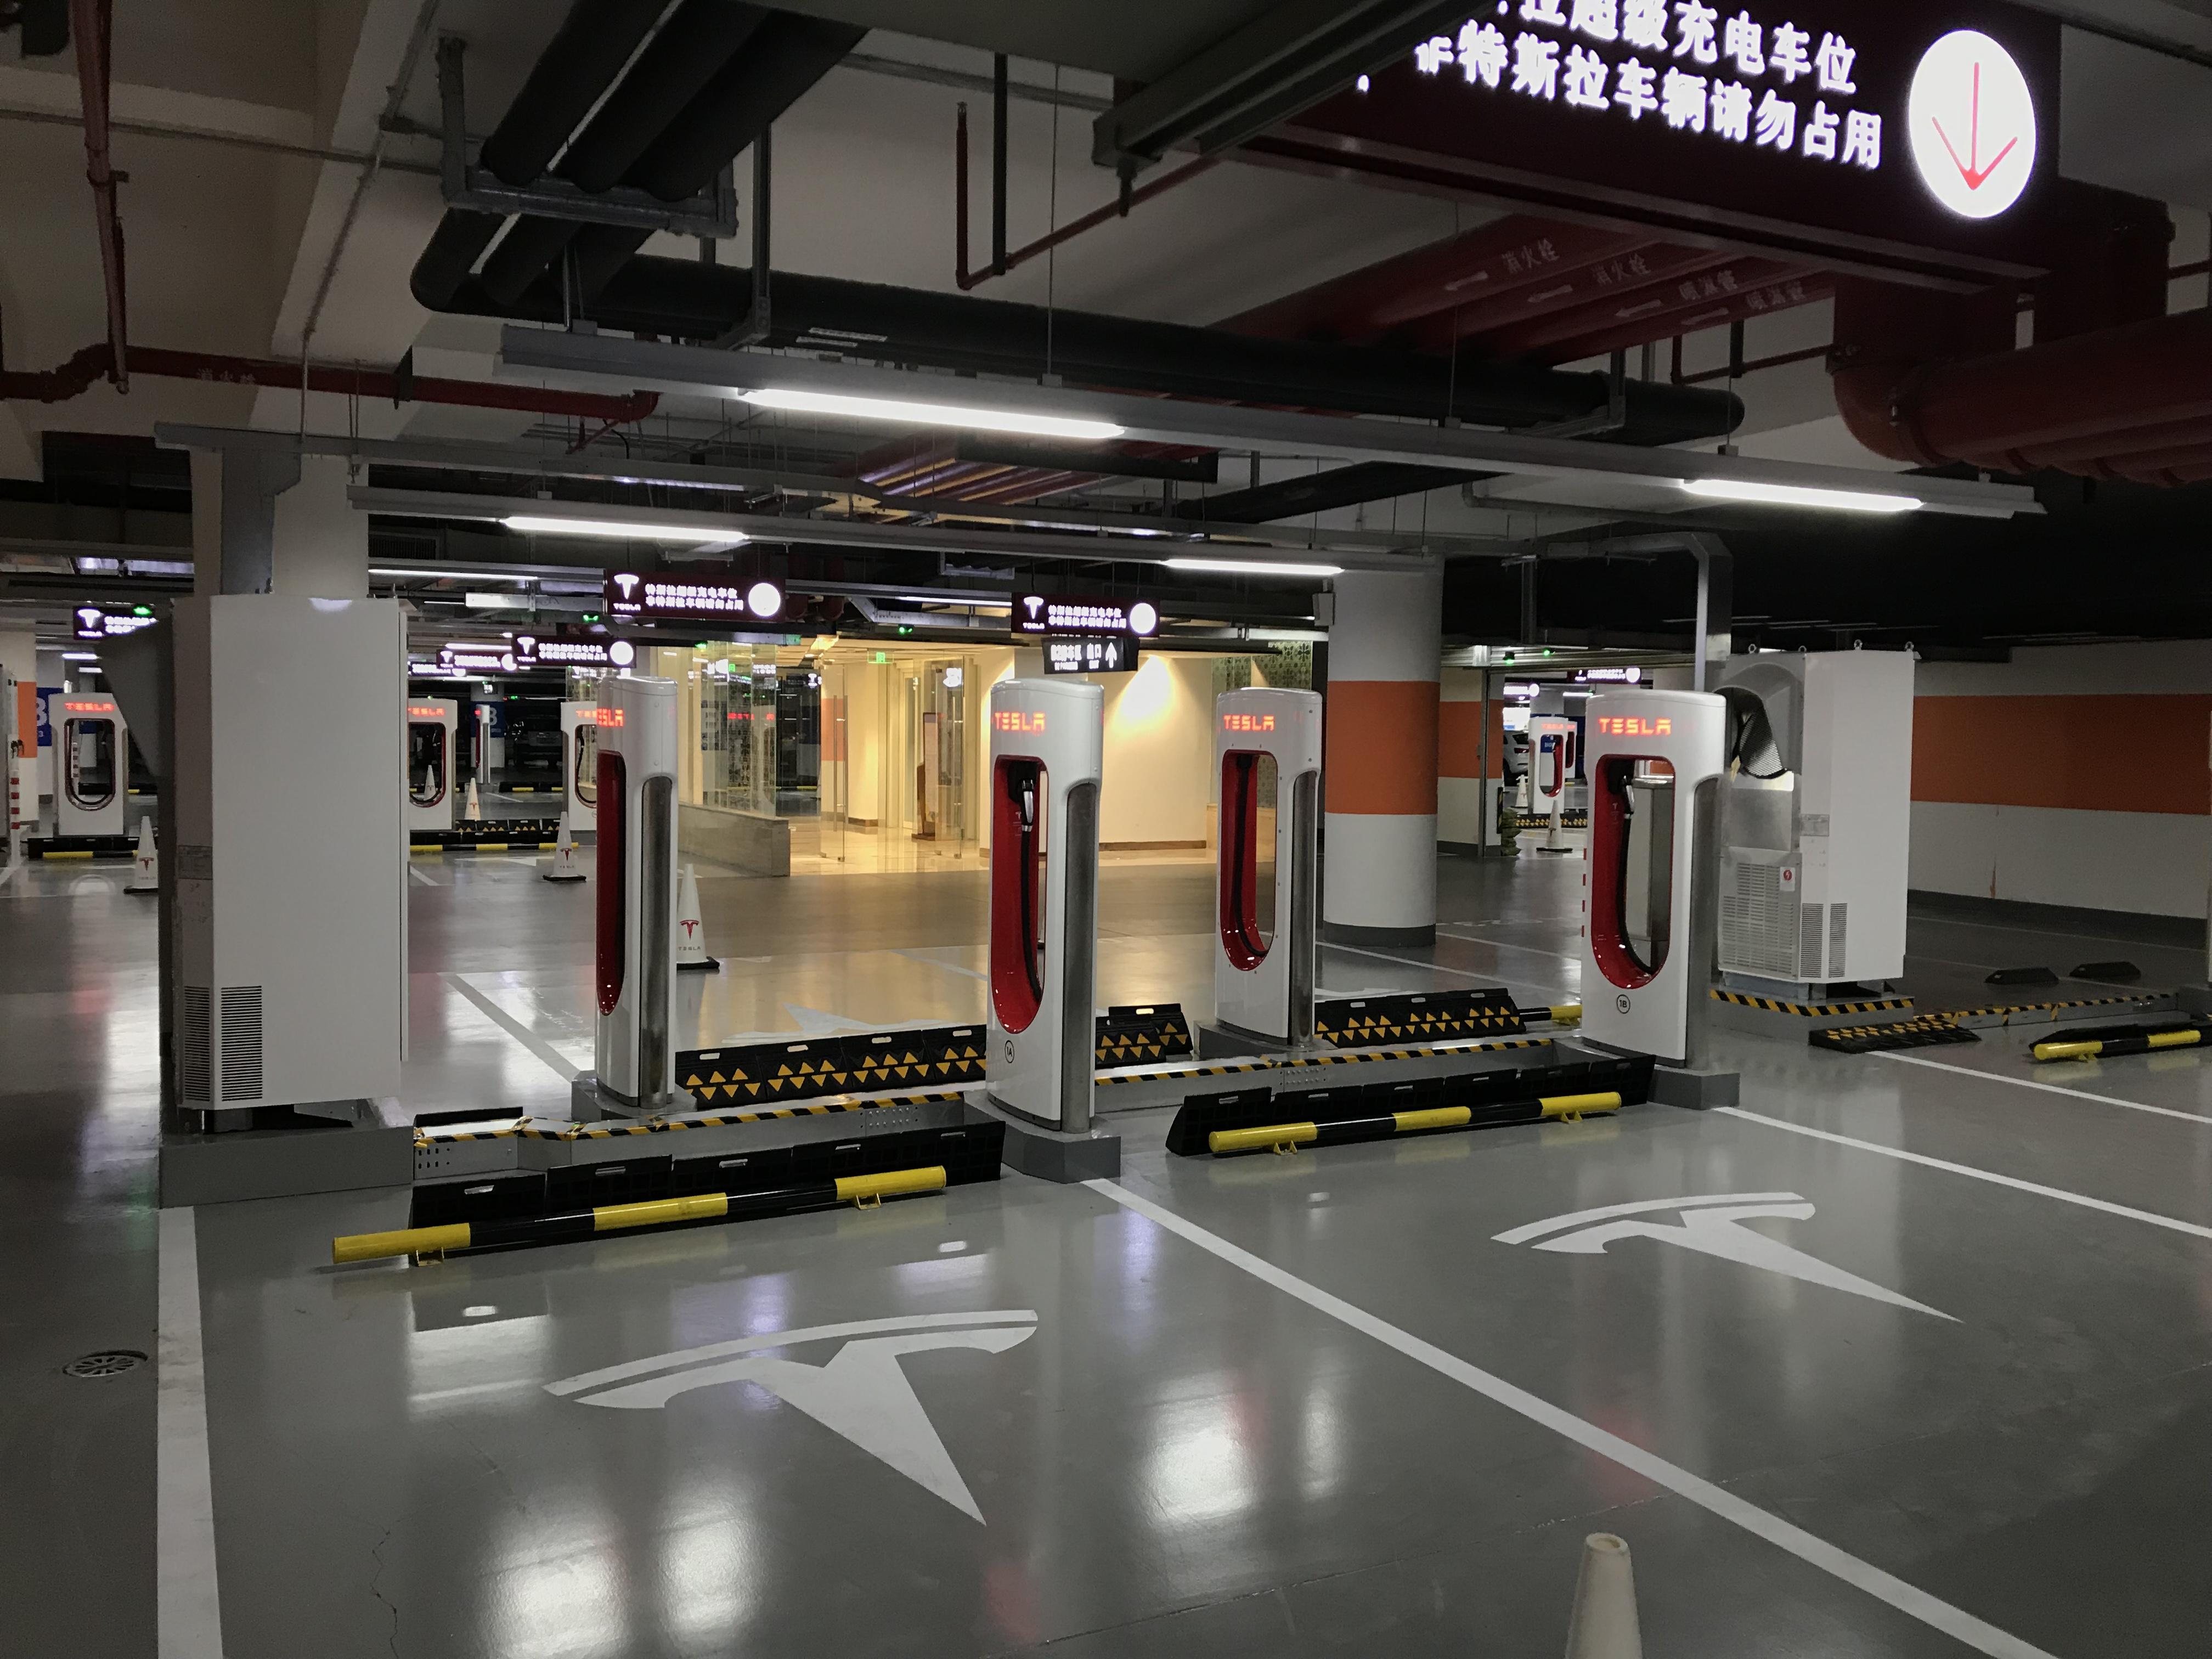 tesla-worlds-largest-supercharger-shanghai-50-stall-4